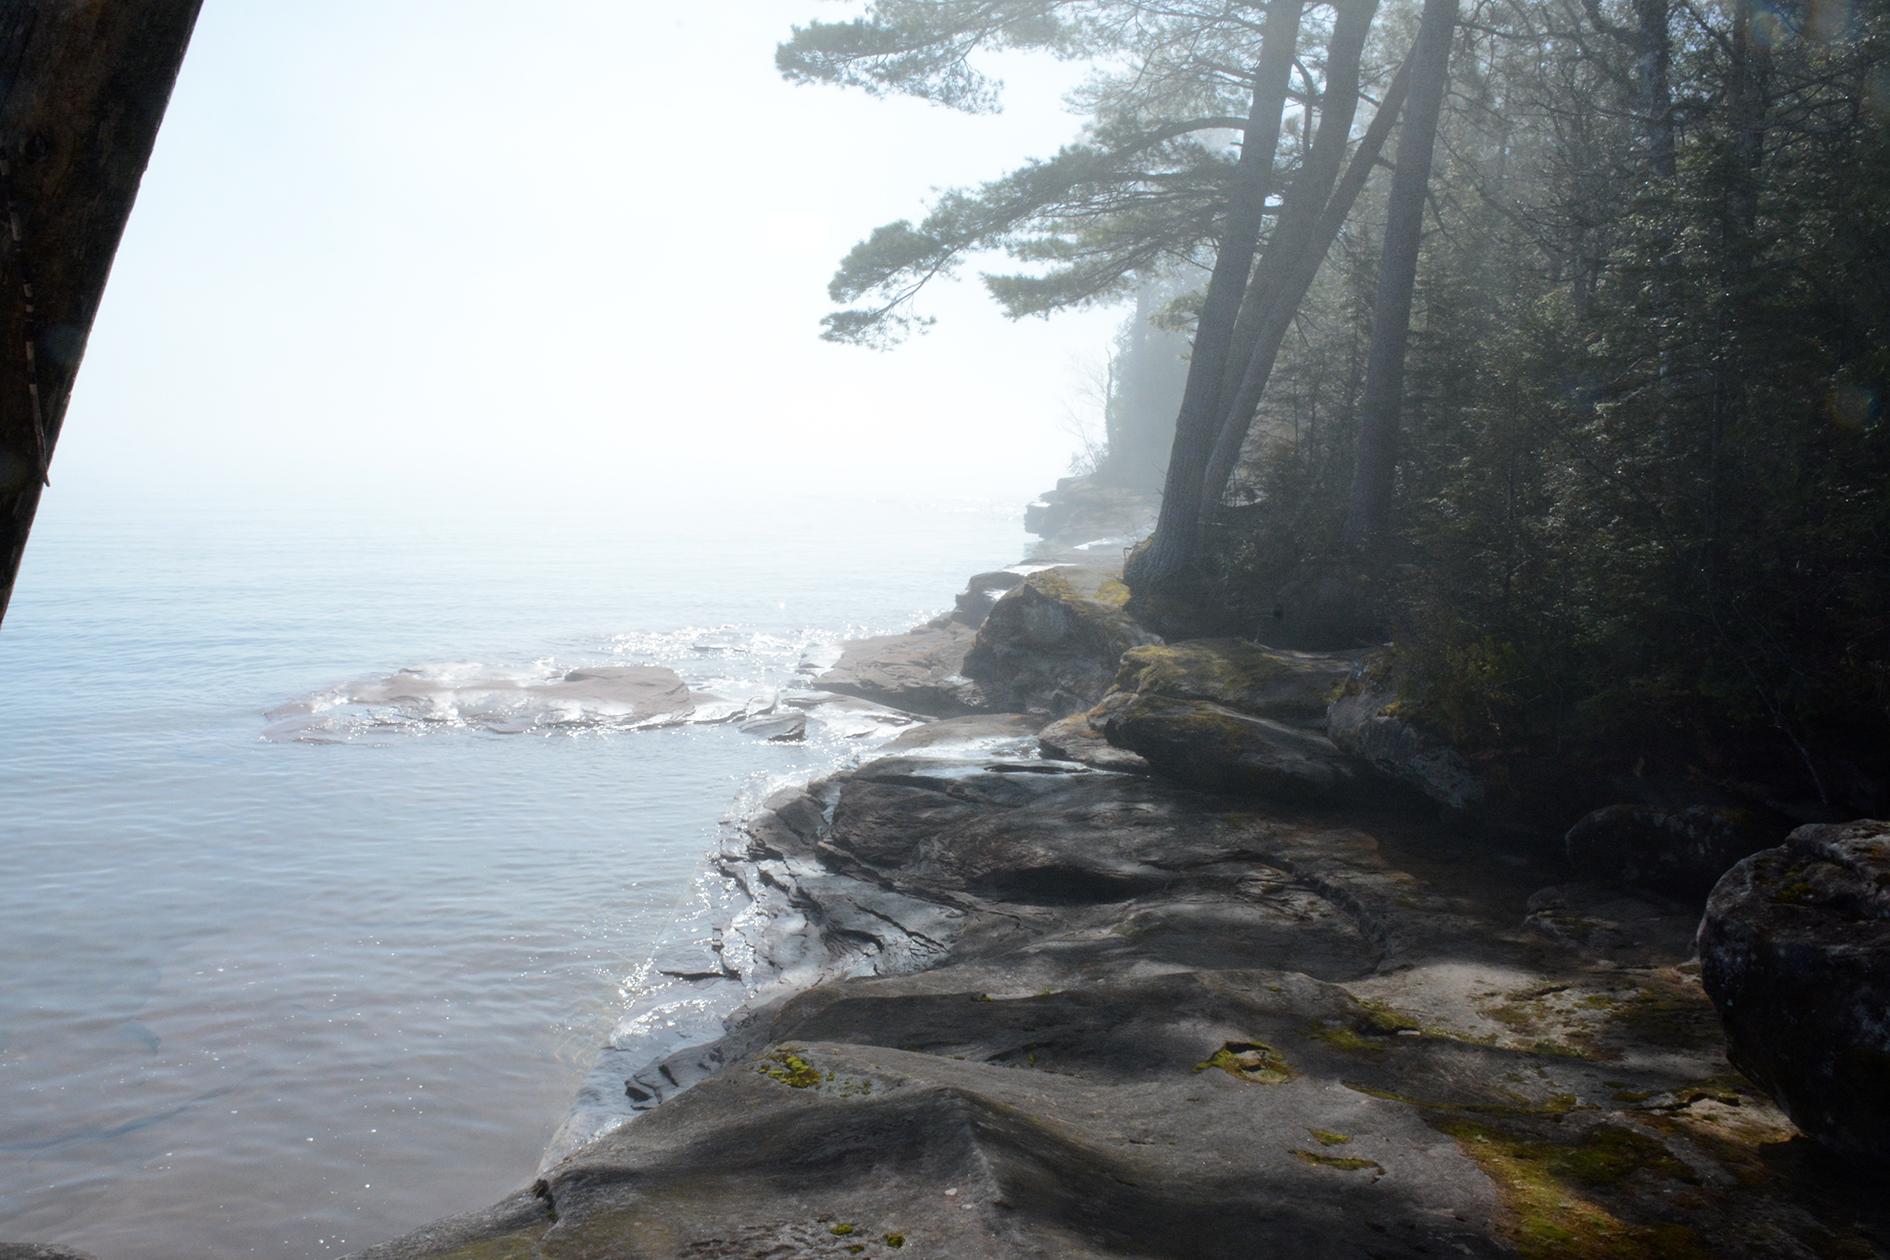 2015-05-16_stocktonisland_rocks-fog